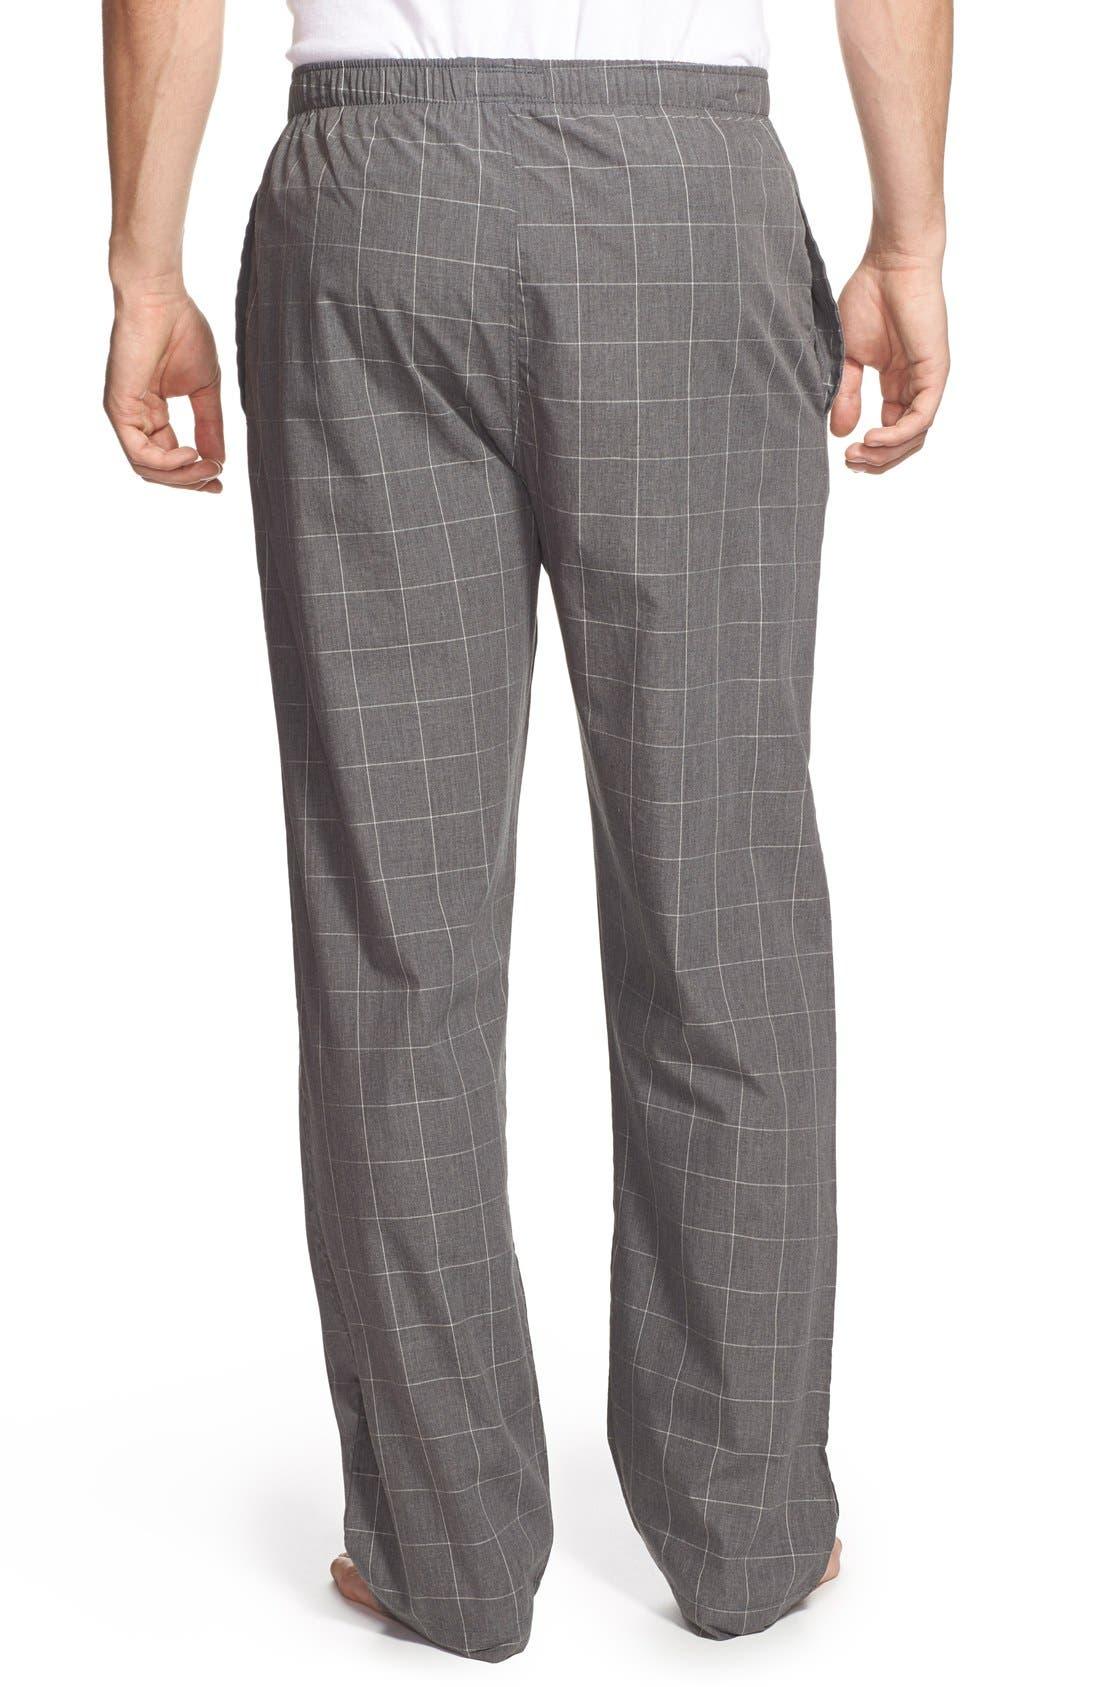 742c3189f01c Polo Ralph Lauren Clothing